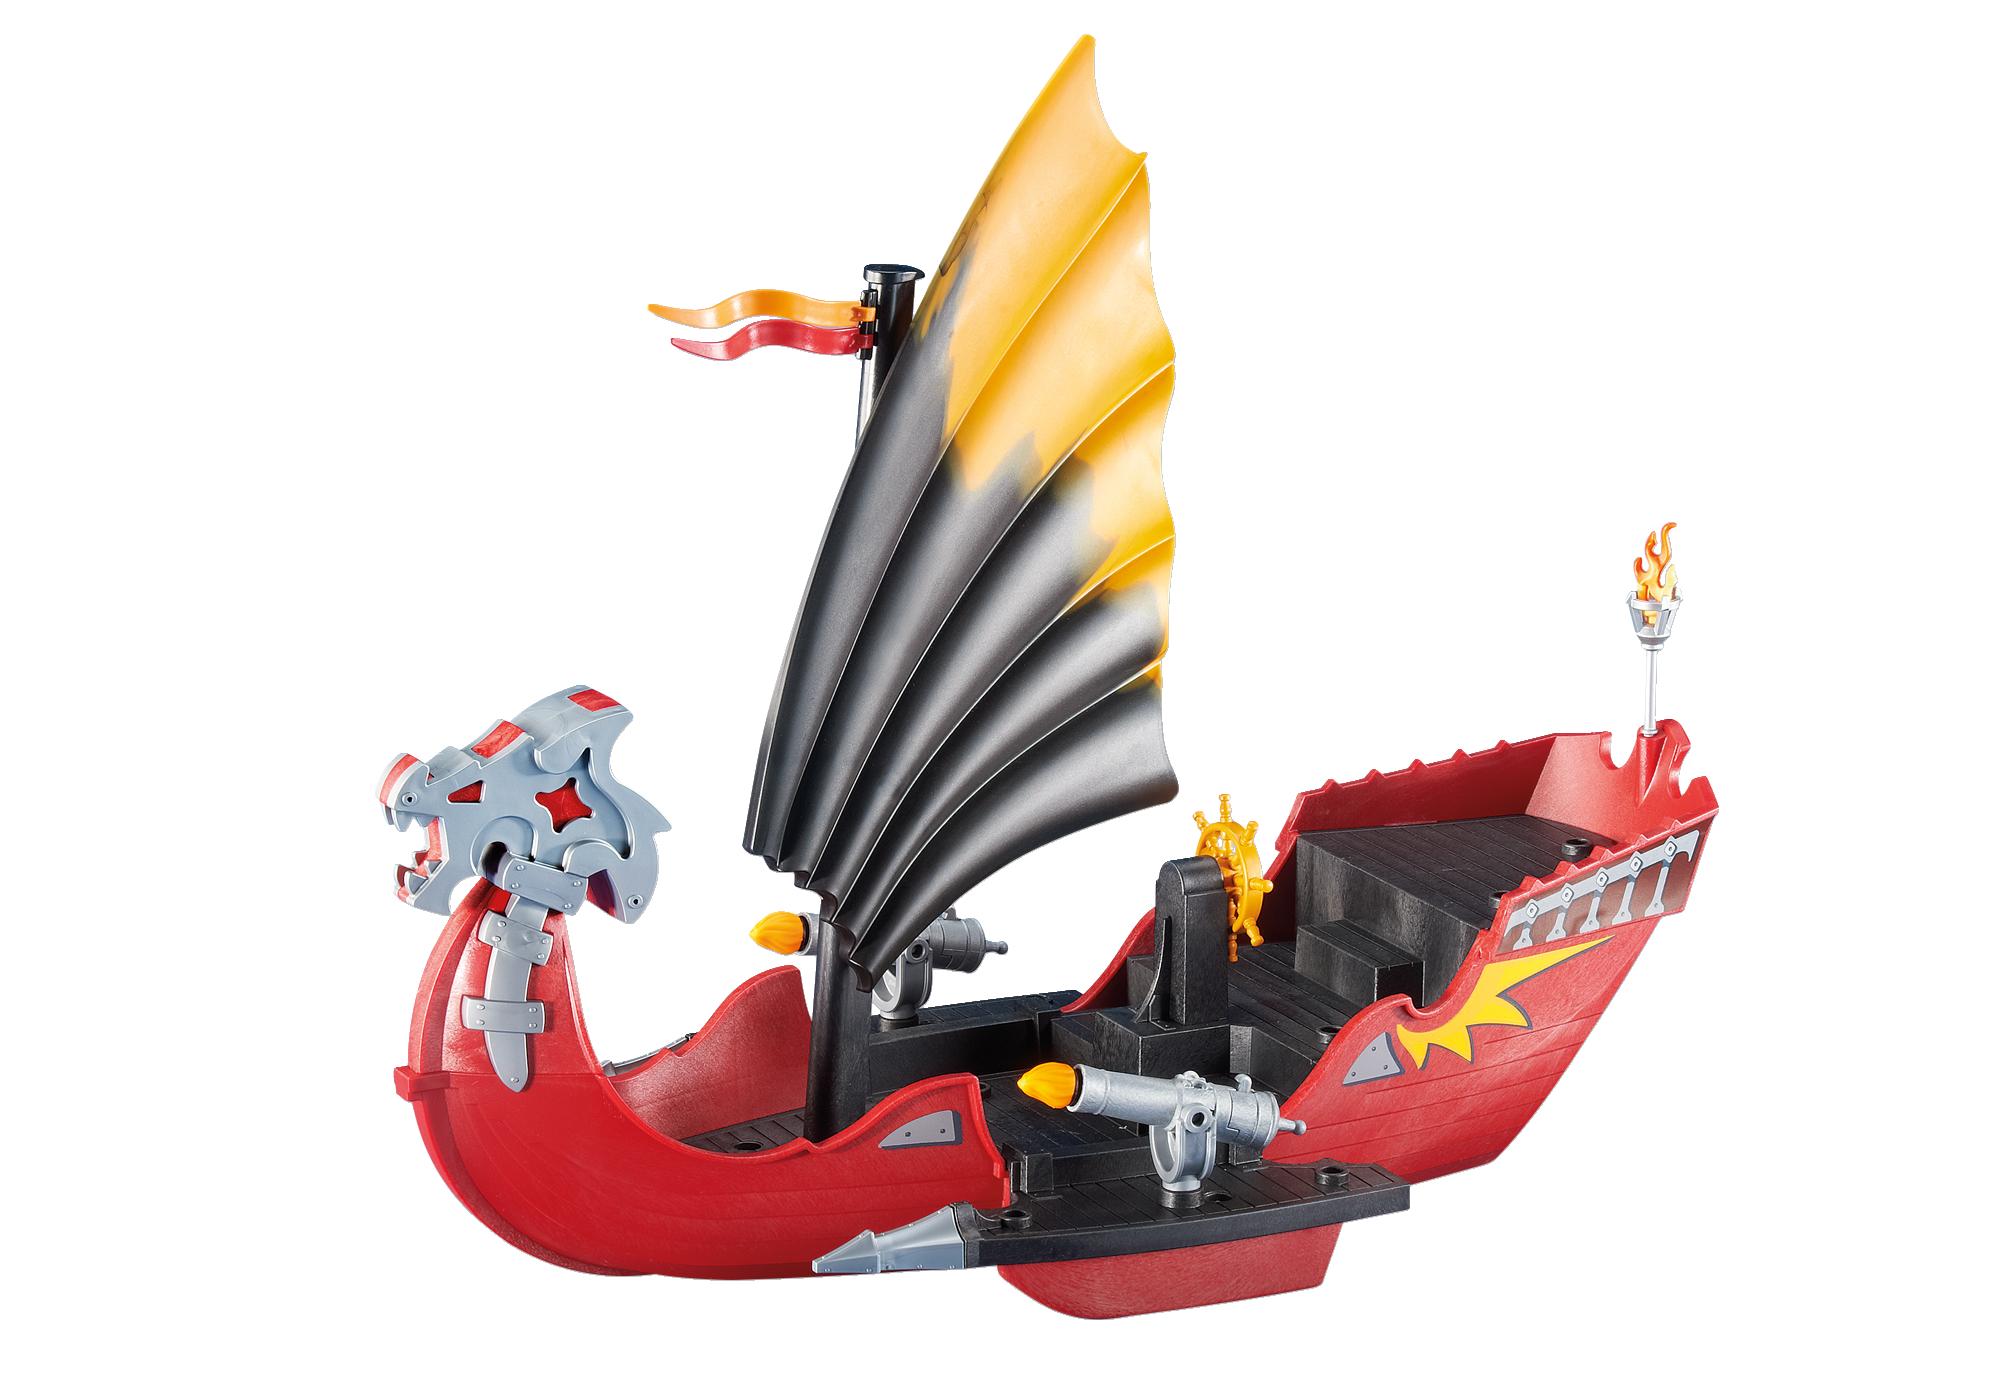 http://media.playmobil.com/i/playmobil/6497_product_detail/Drachen-Kampfschiff